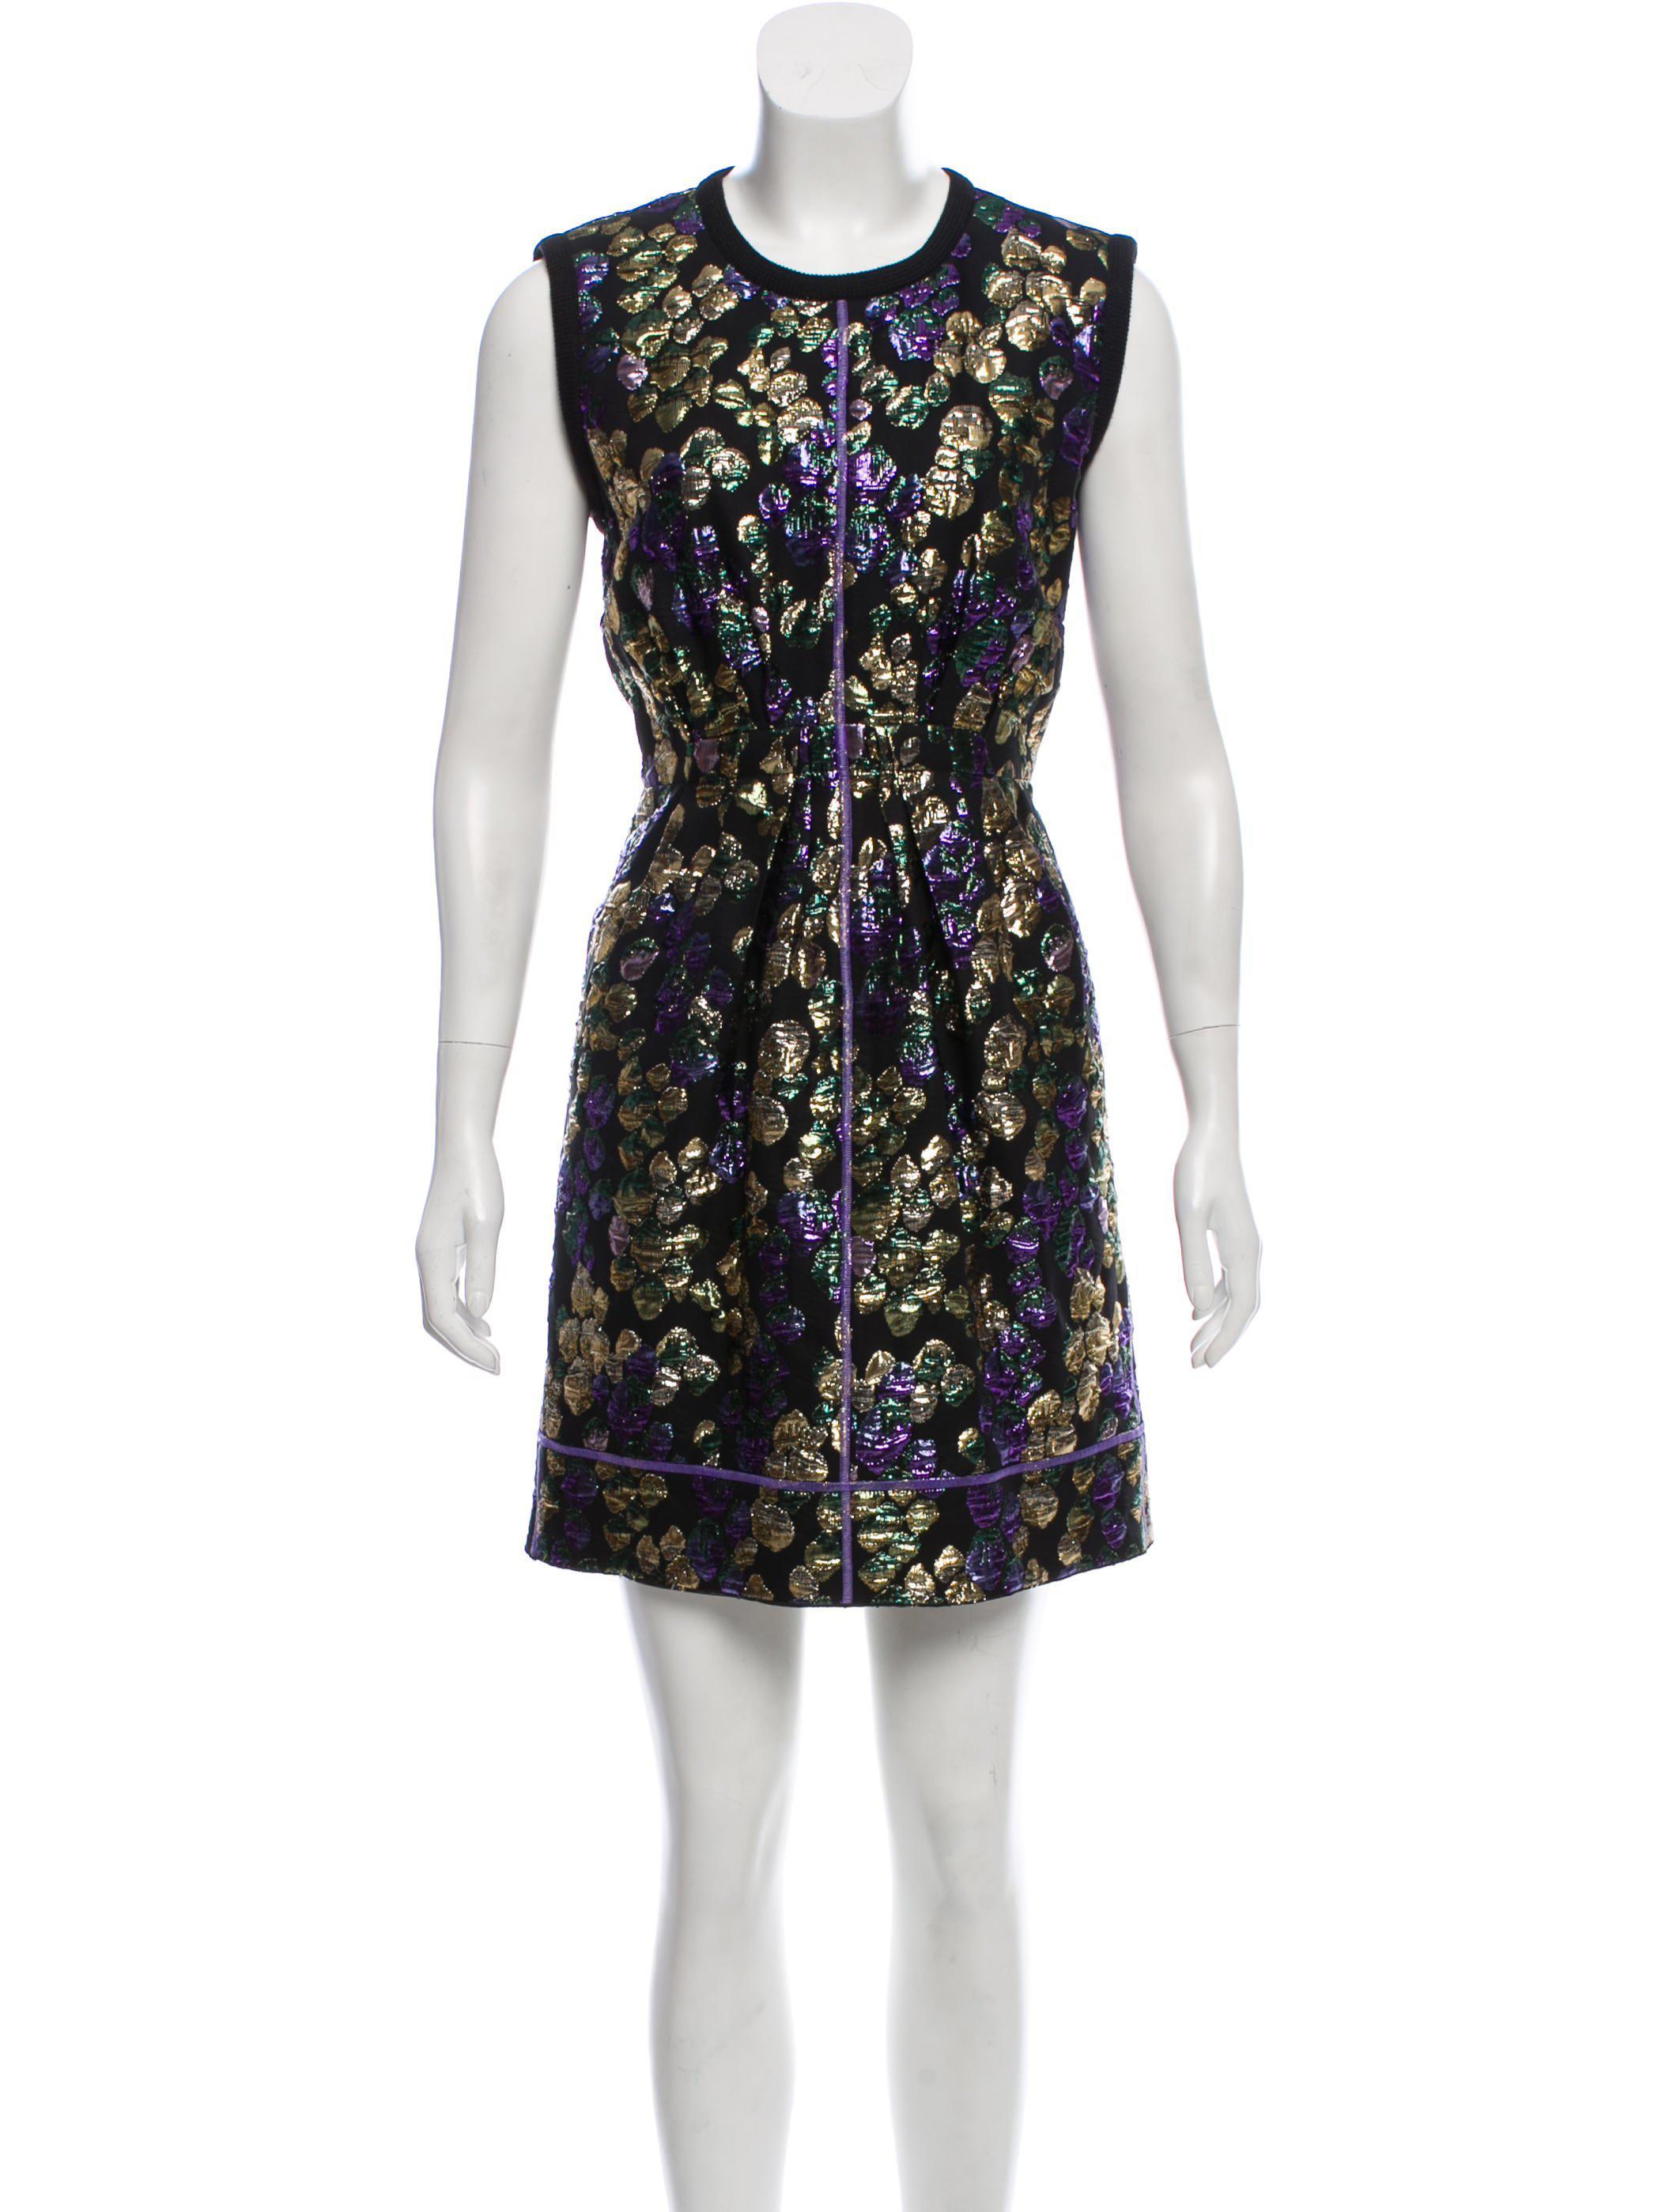 brocade dress - Black Marc Jacobs Aaa Quality b55nIgzy